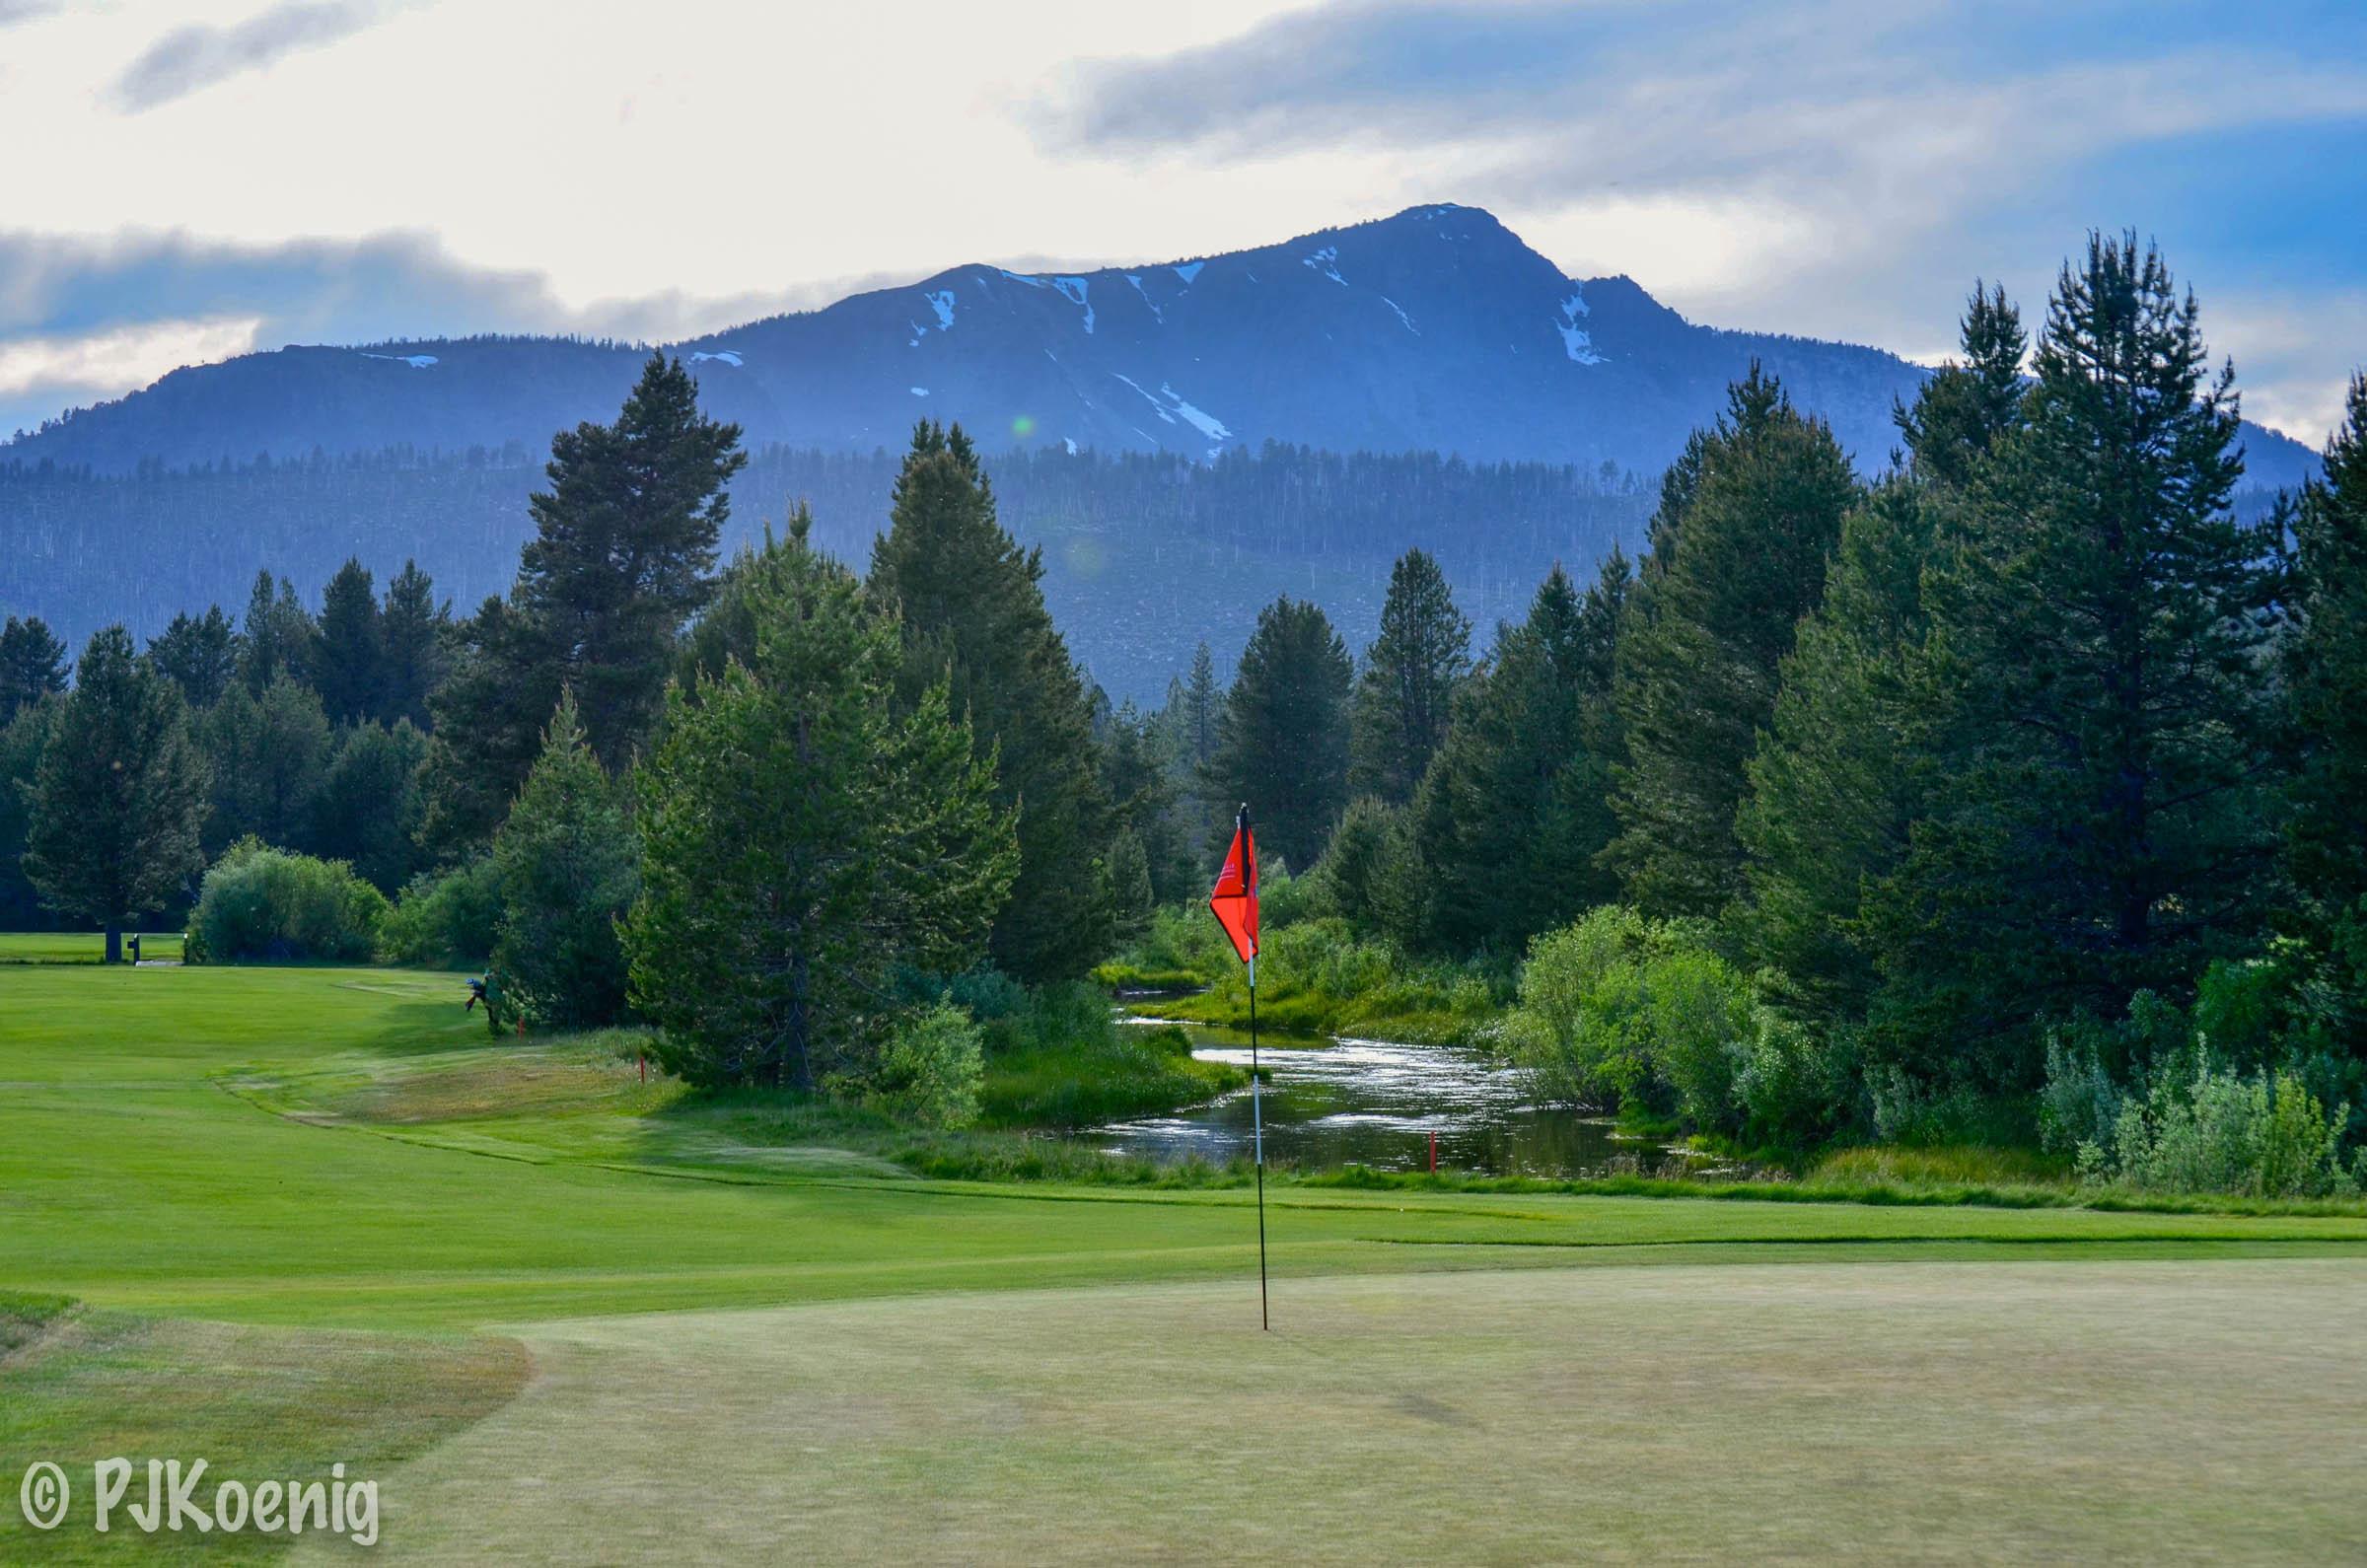 Lake Tahoe Golf Course - South Lake Tahoe, CA